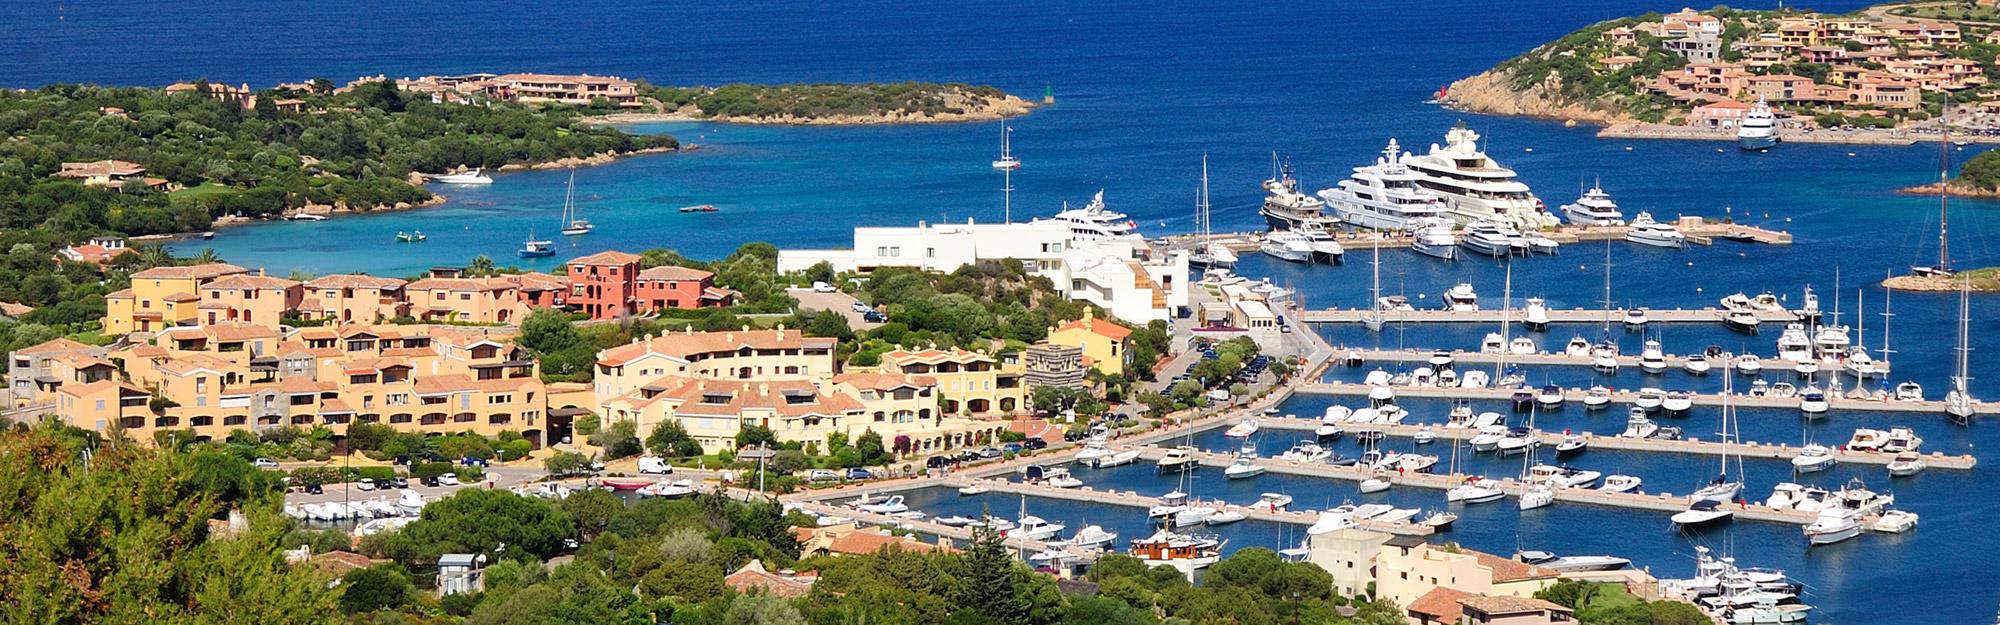 Seastarshipping Maritime Agecny Costa Smeralda Sardegna